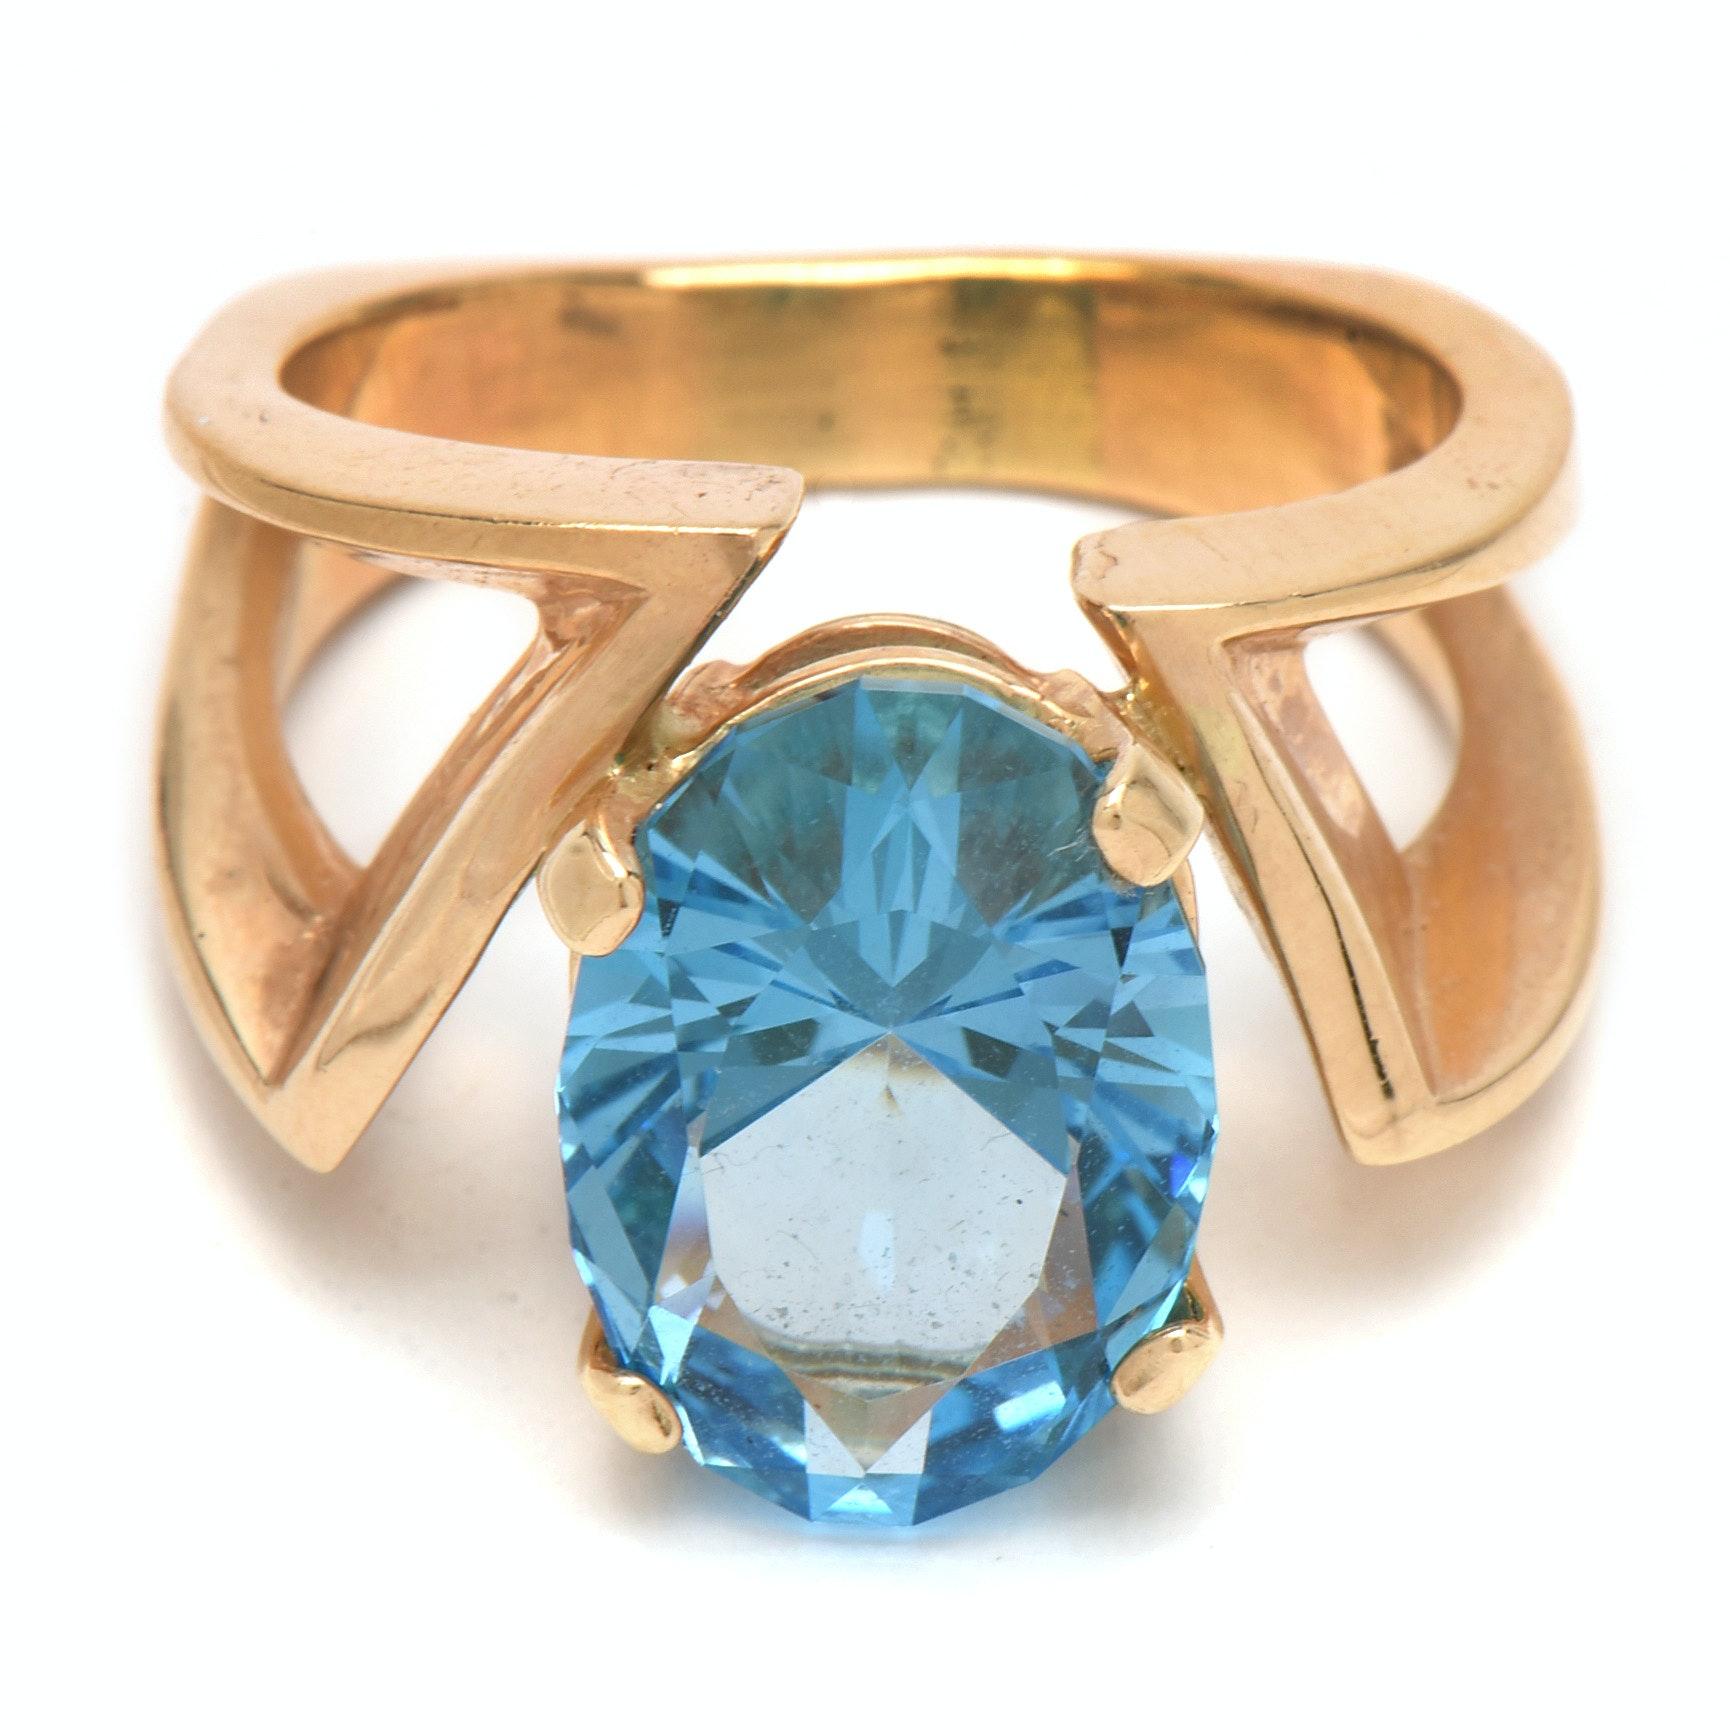 14K Yellow Gold 9.53 Carat Blue Topaz Cocktail Ring